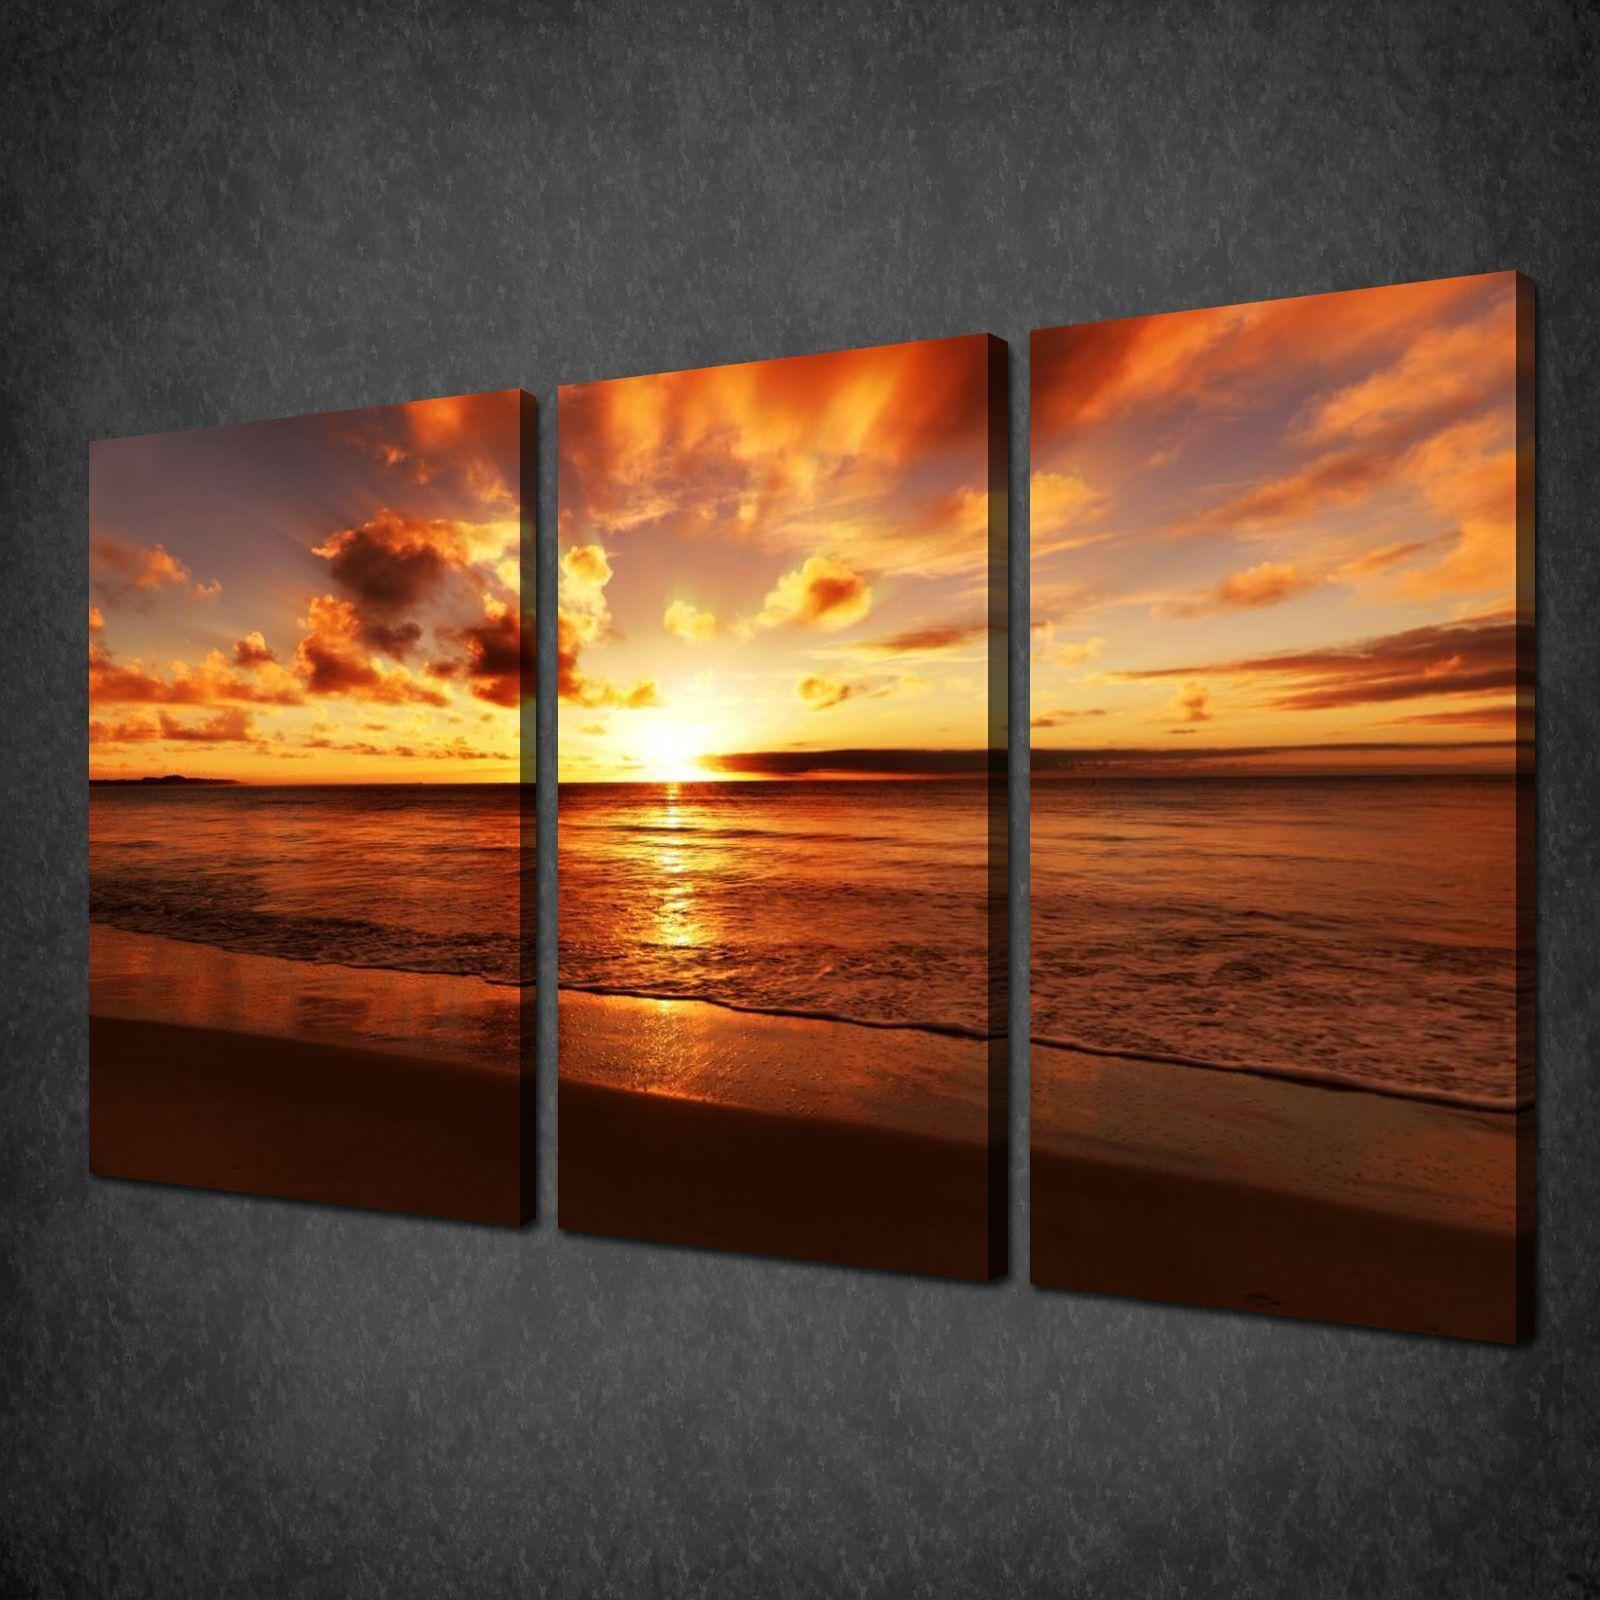 Wall Photo Prints Uk